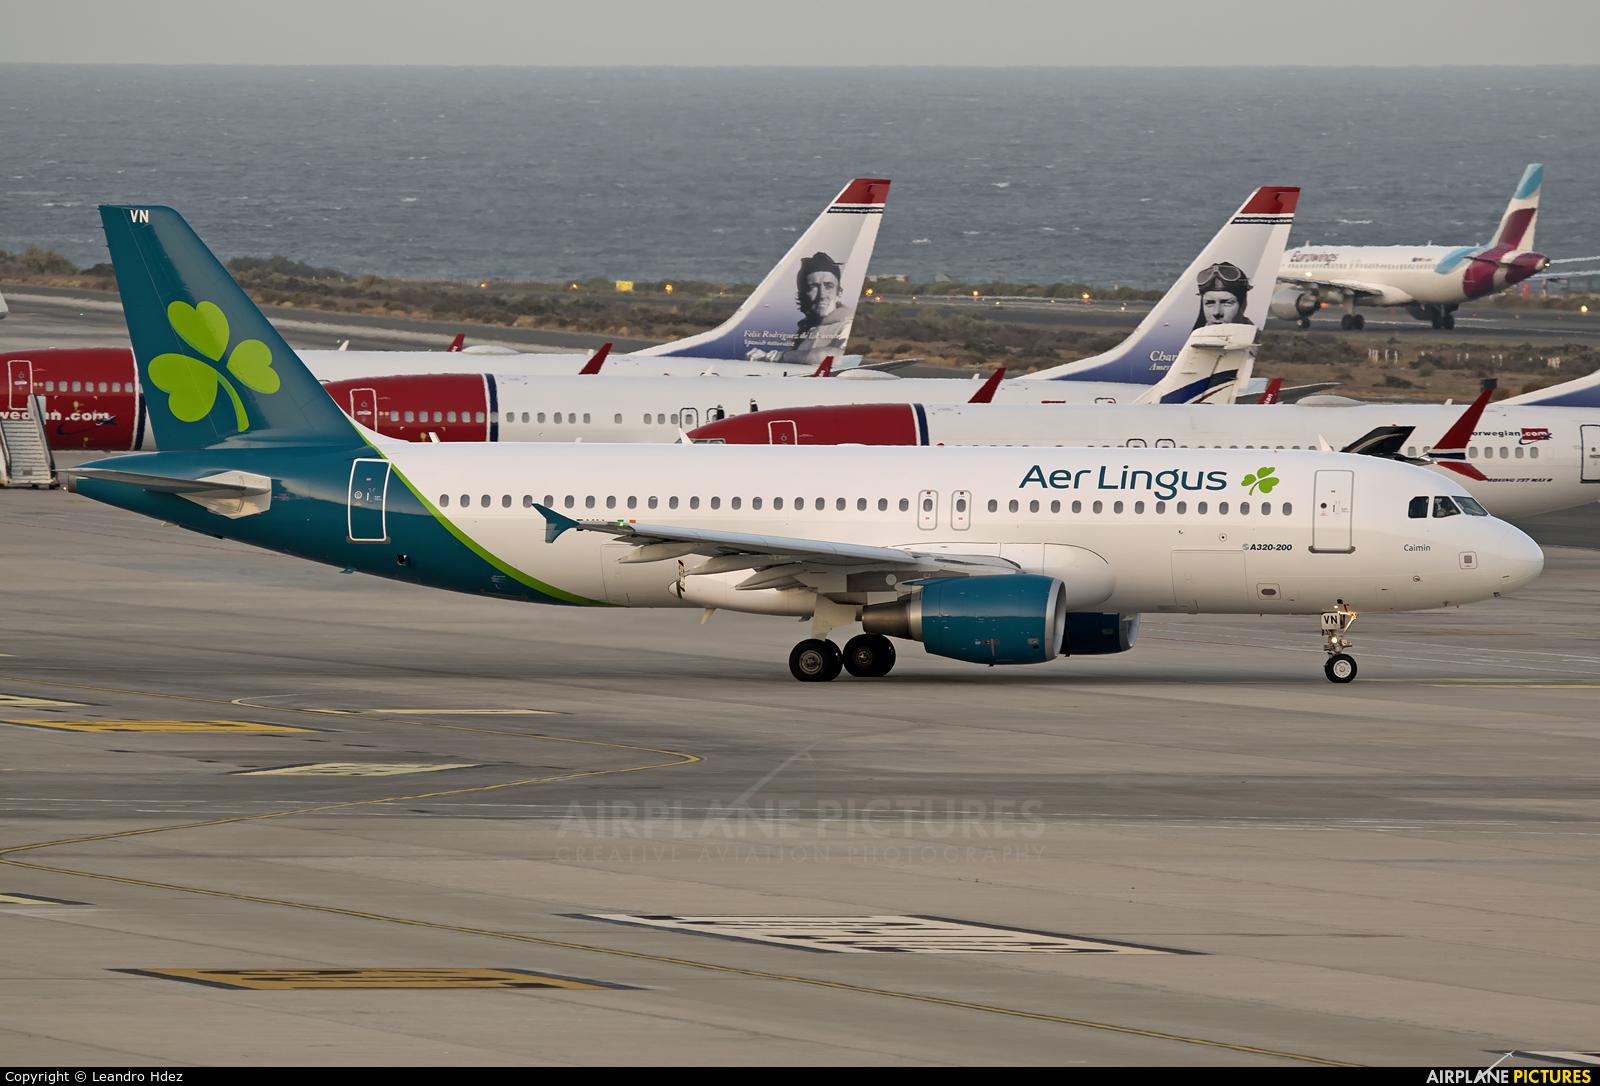 Aer Lingus EI-DVN aircraft at Aeropuerto de Gran Canaria